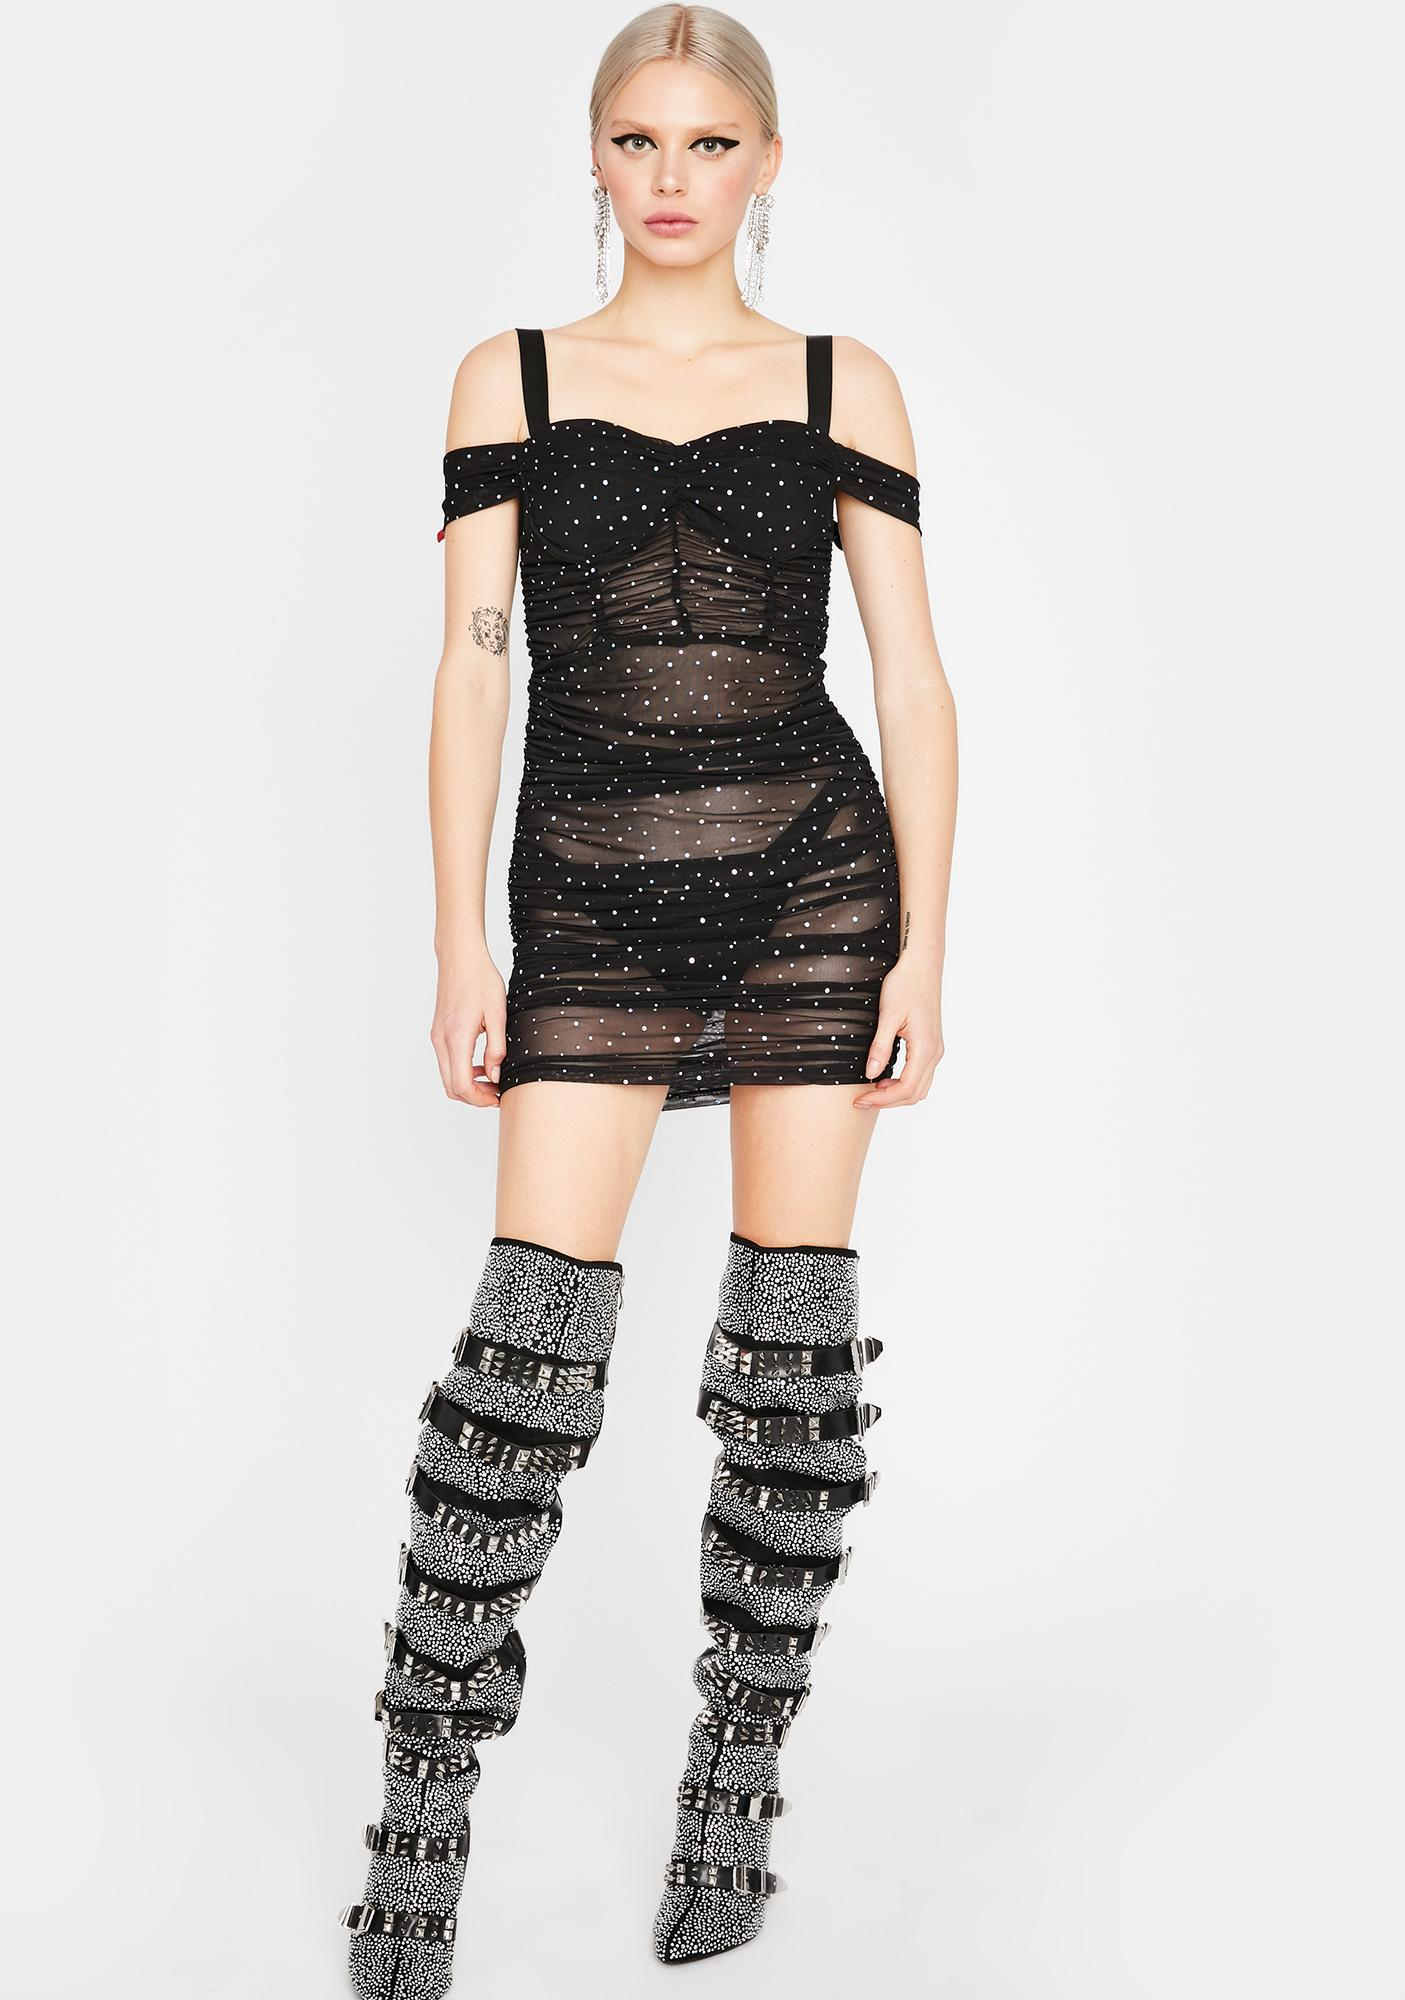 Stay Lit Mesh Dress